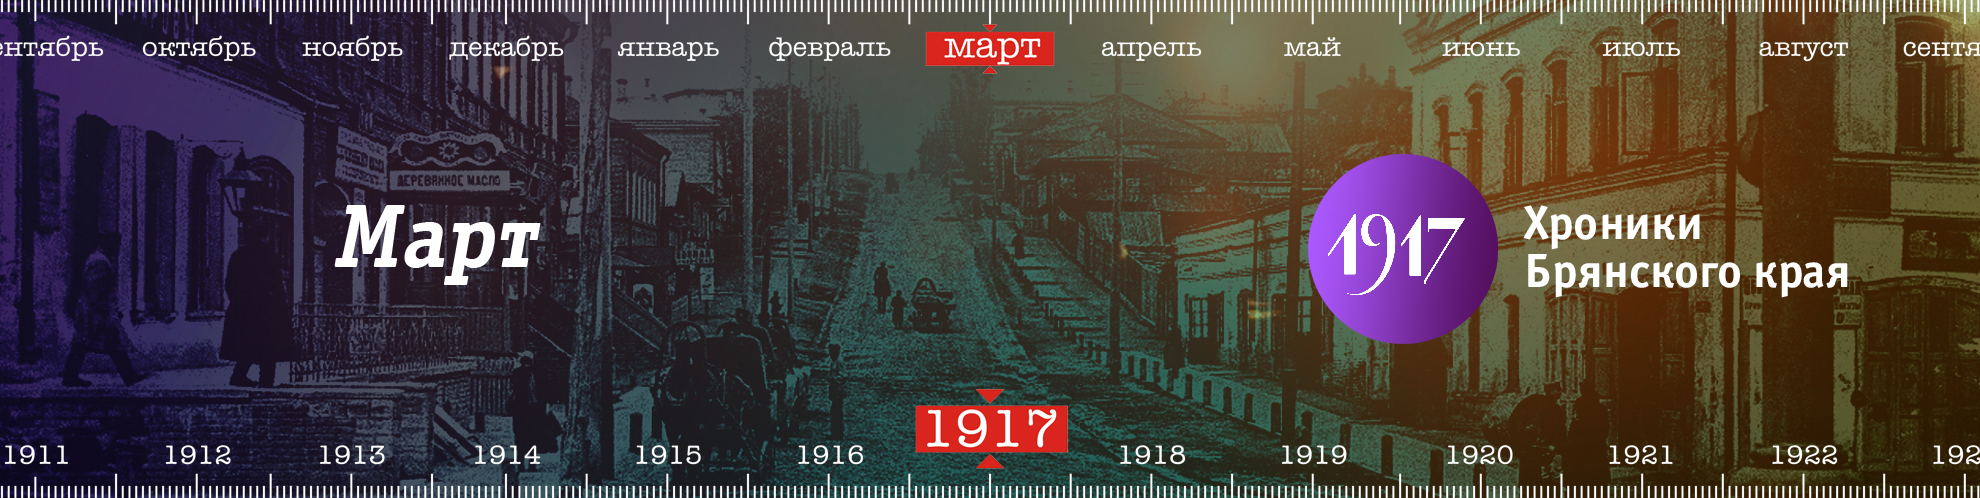 1917. Хроники Брянского края - Март